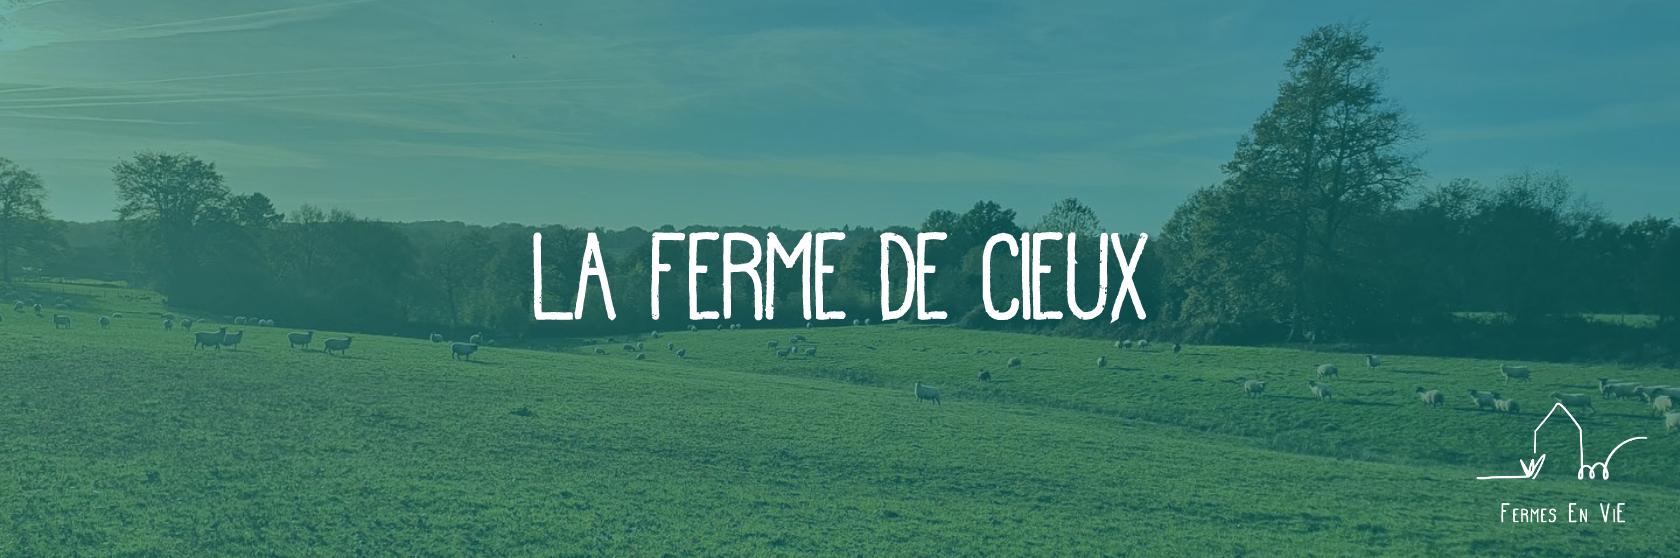 HeaderFermes_Cieux (1)